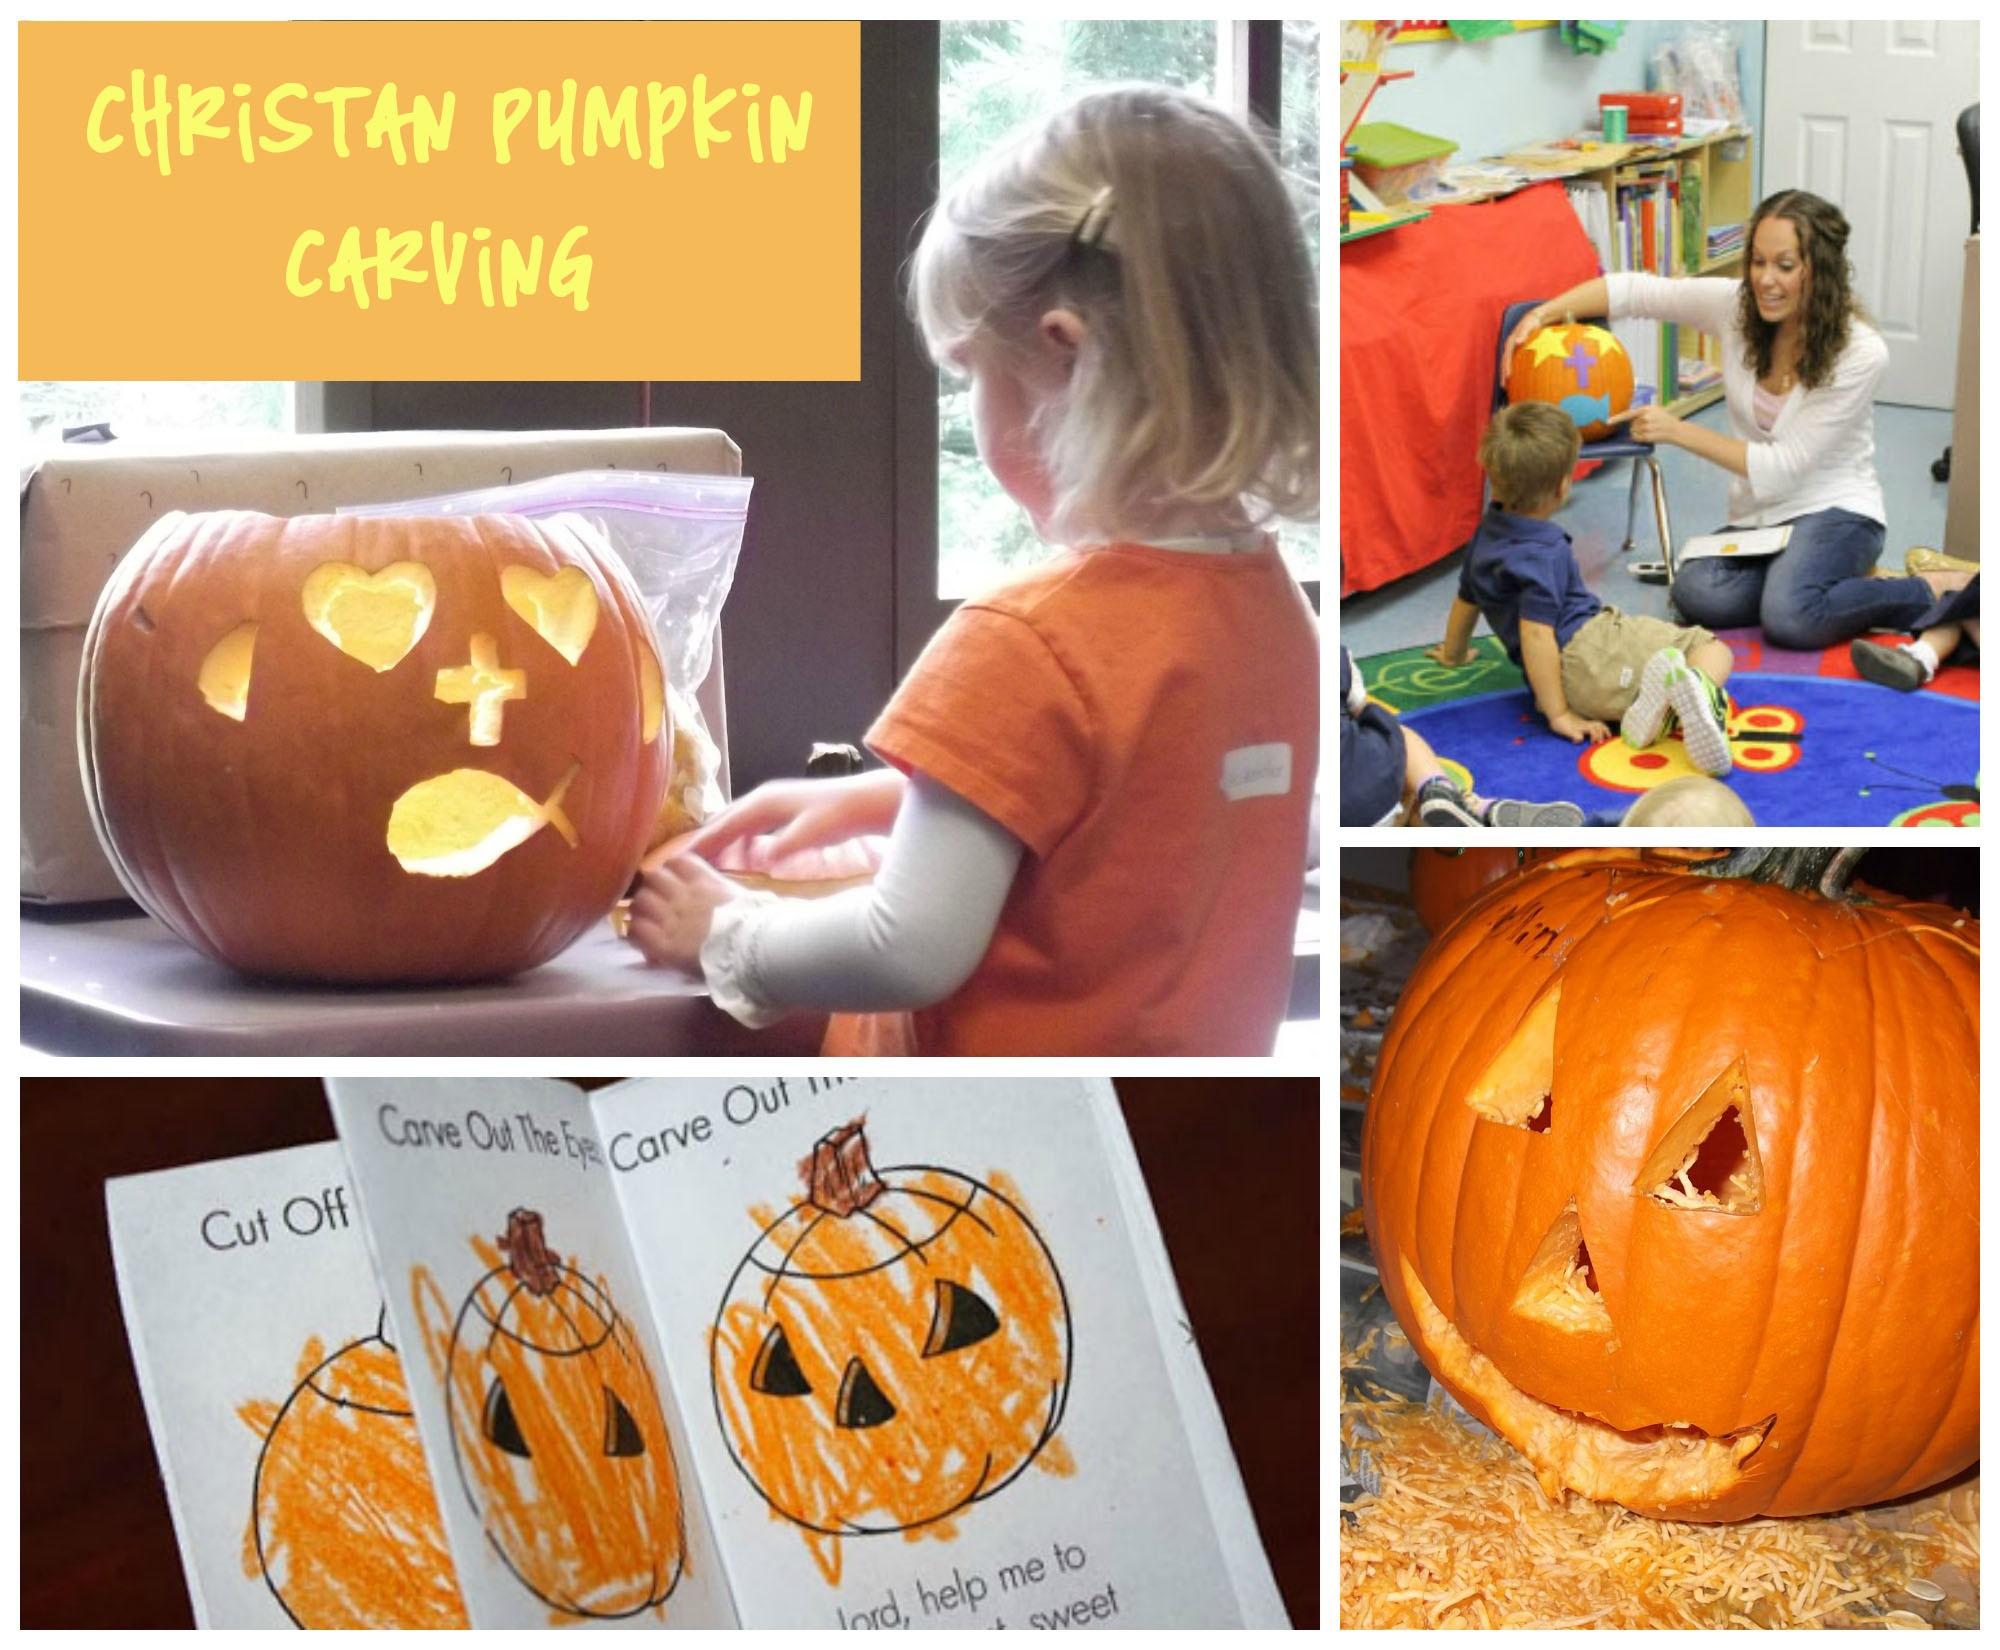 Christian Pumpkin Carving | Celebrating Holidays - Free Christian Pumpkin Carving Printables